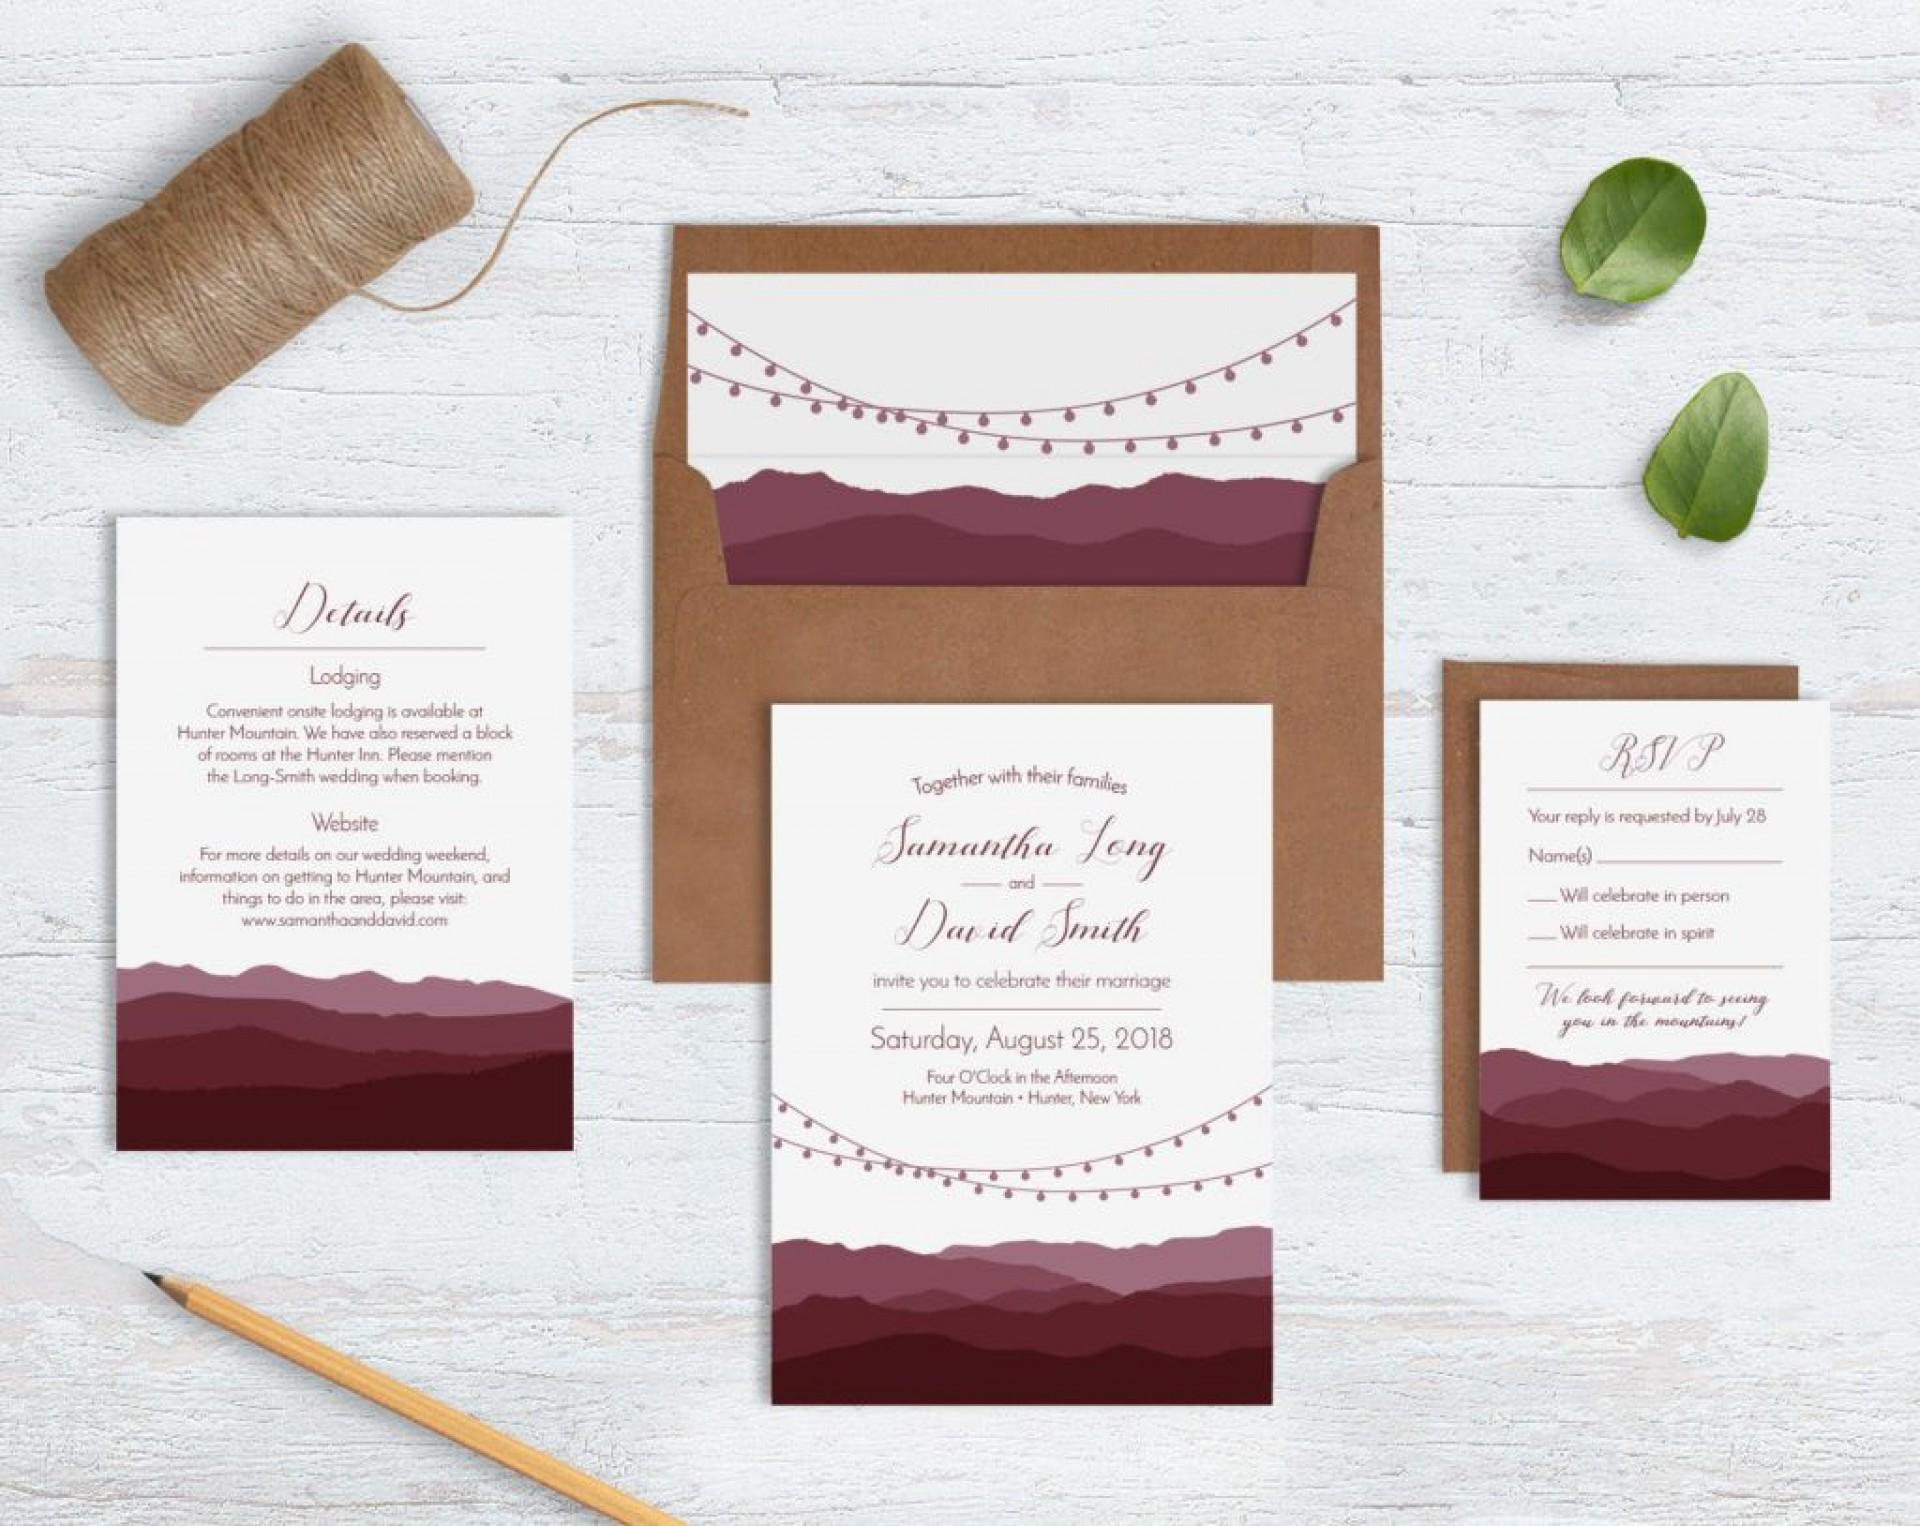 005 Imposing Formal Wedding Invitation Wording Template High Resolution  Templates1920